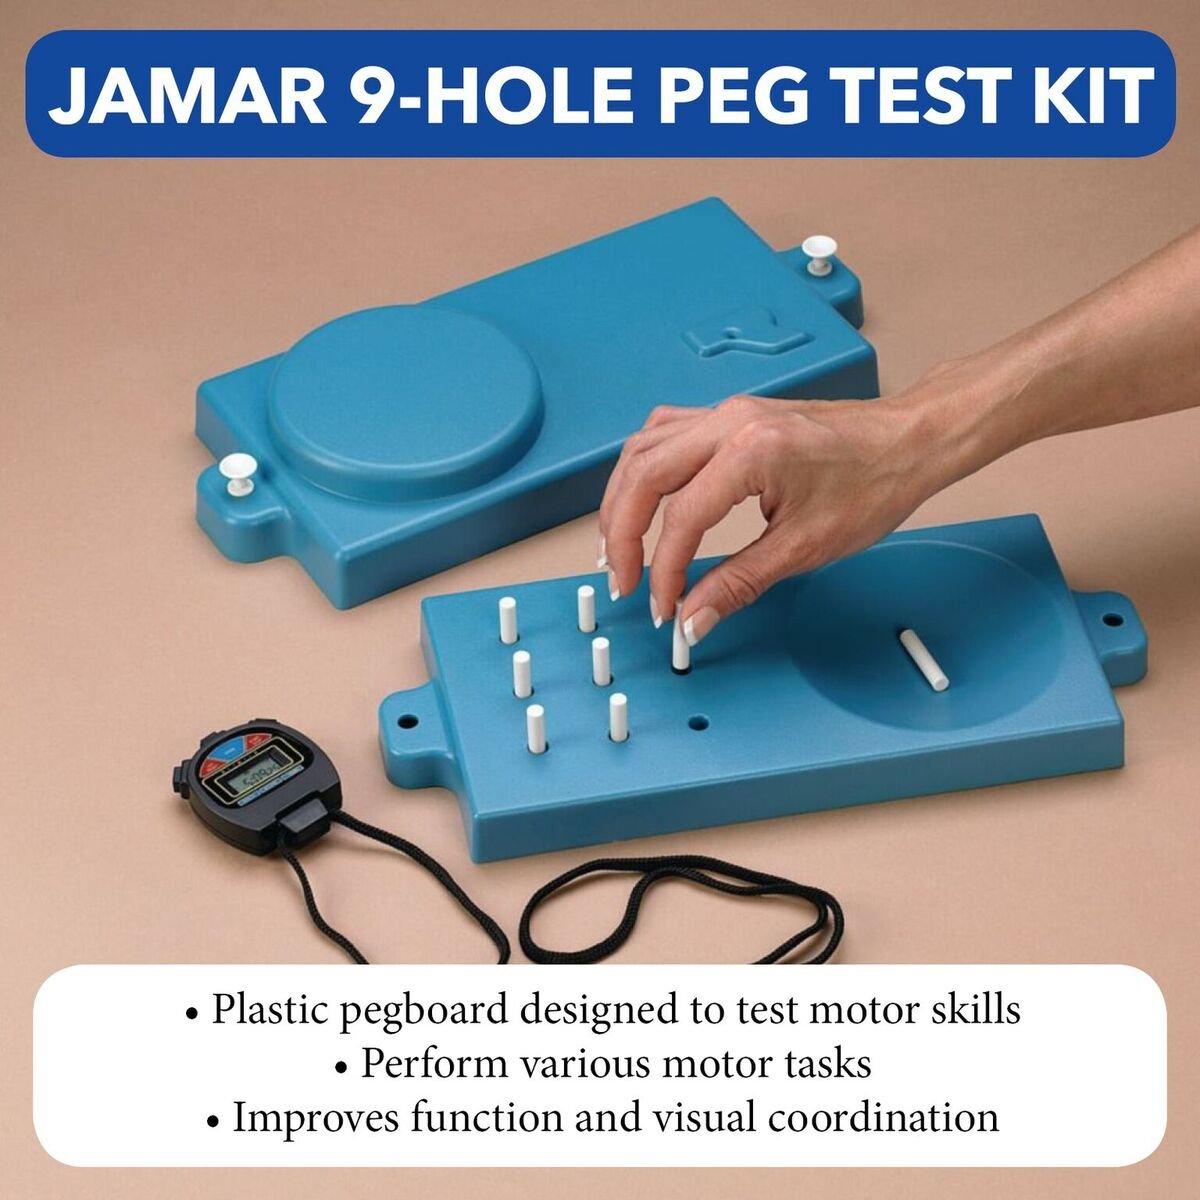 Amazon.com: Jamar 9-Hole Peg Test Kit, Pegboard Set & Stopwatch ...